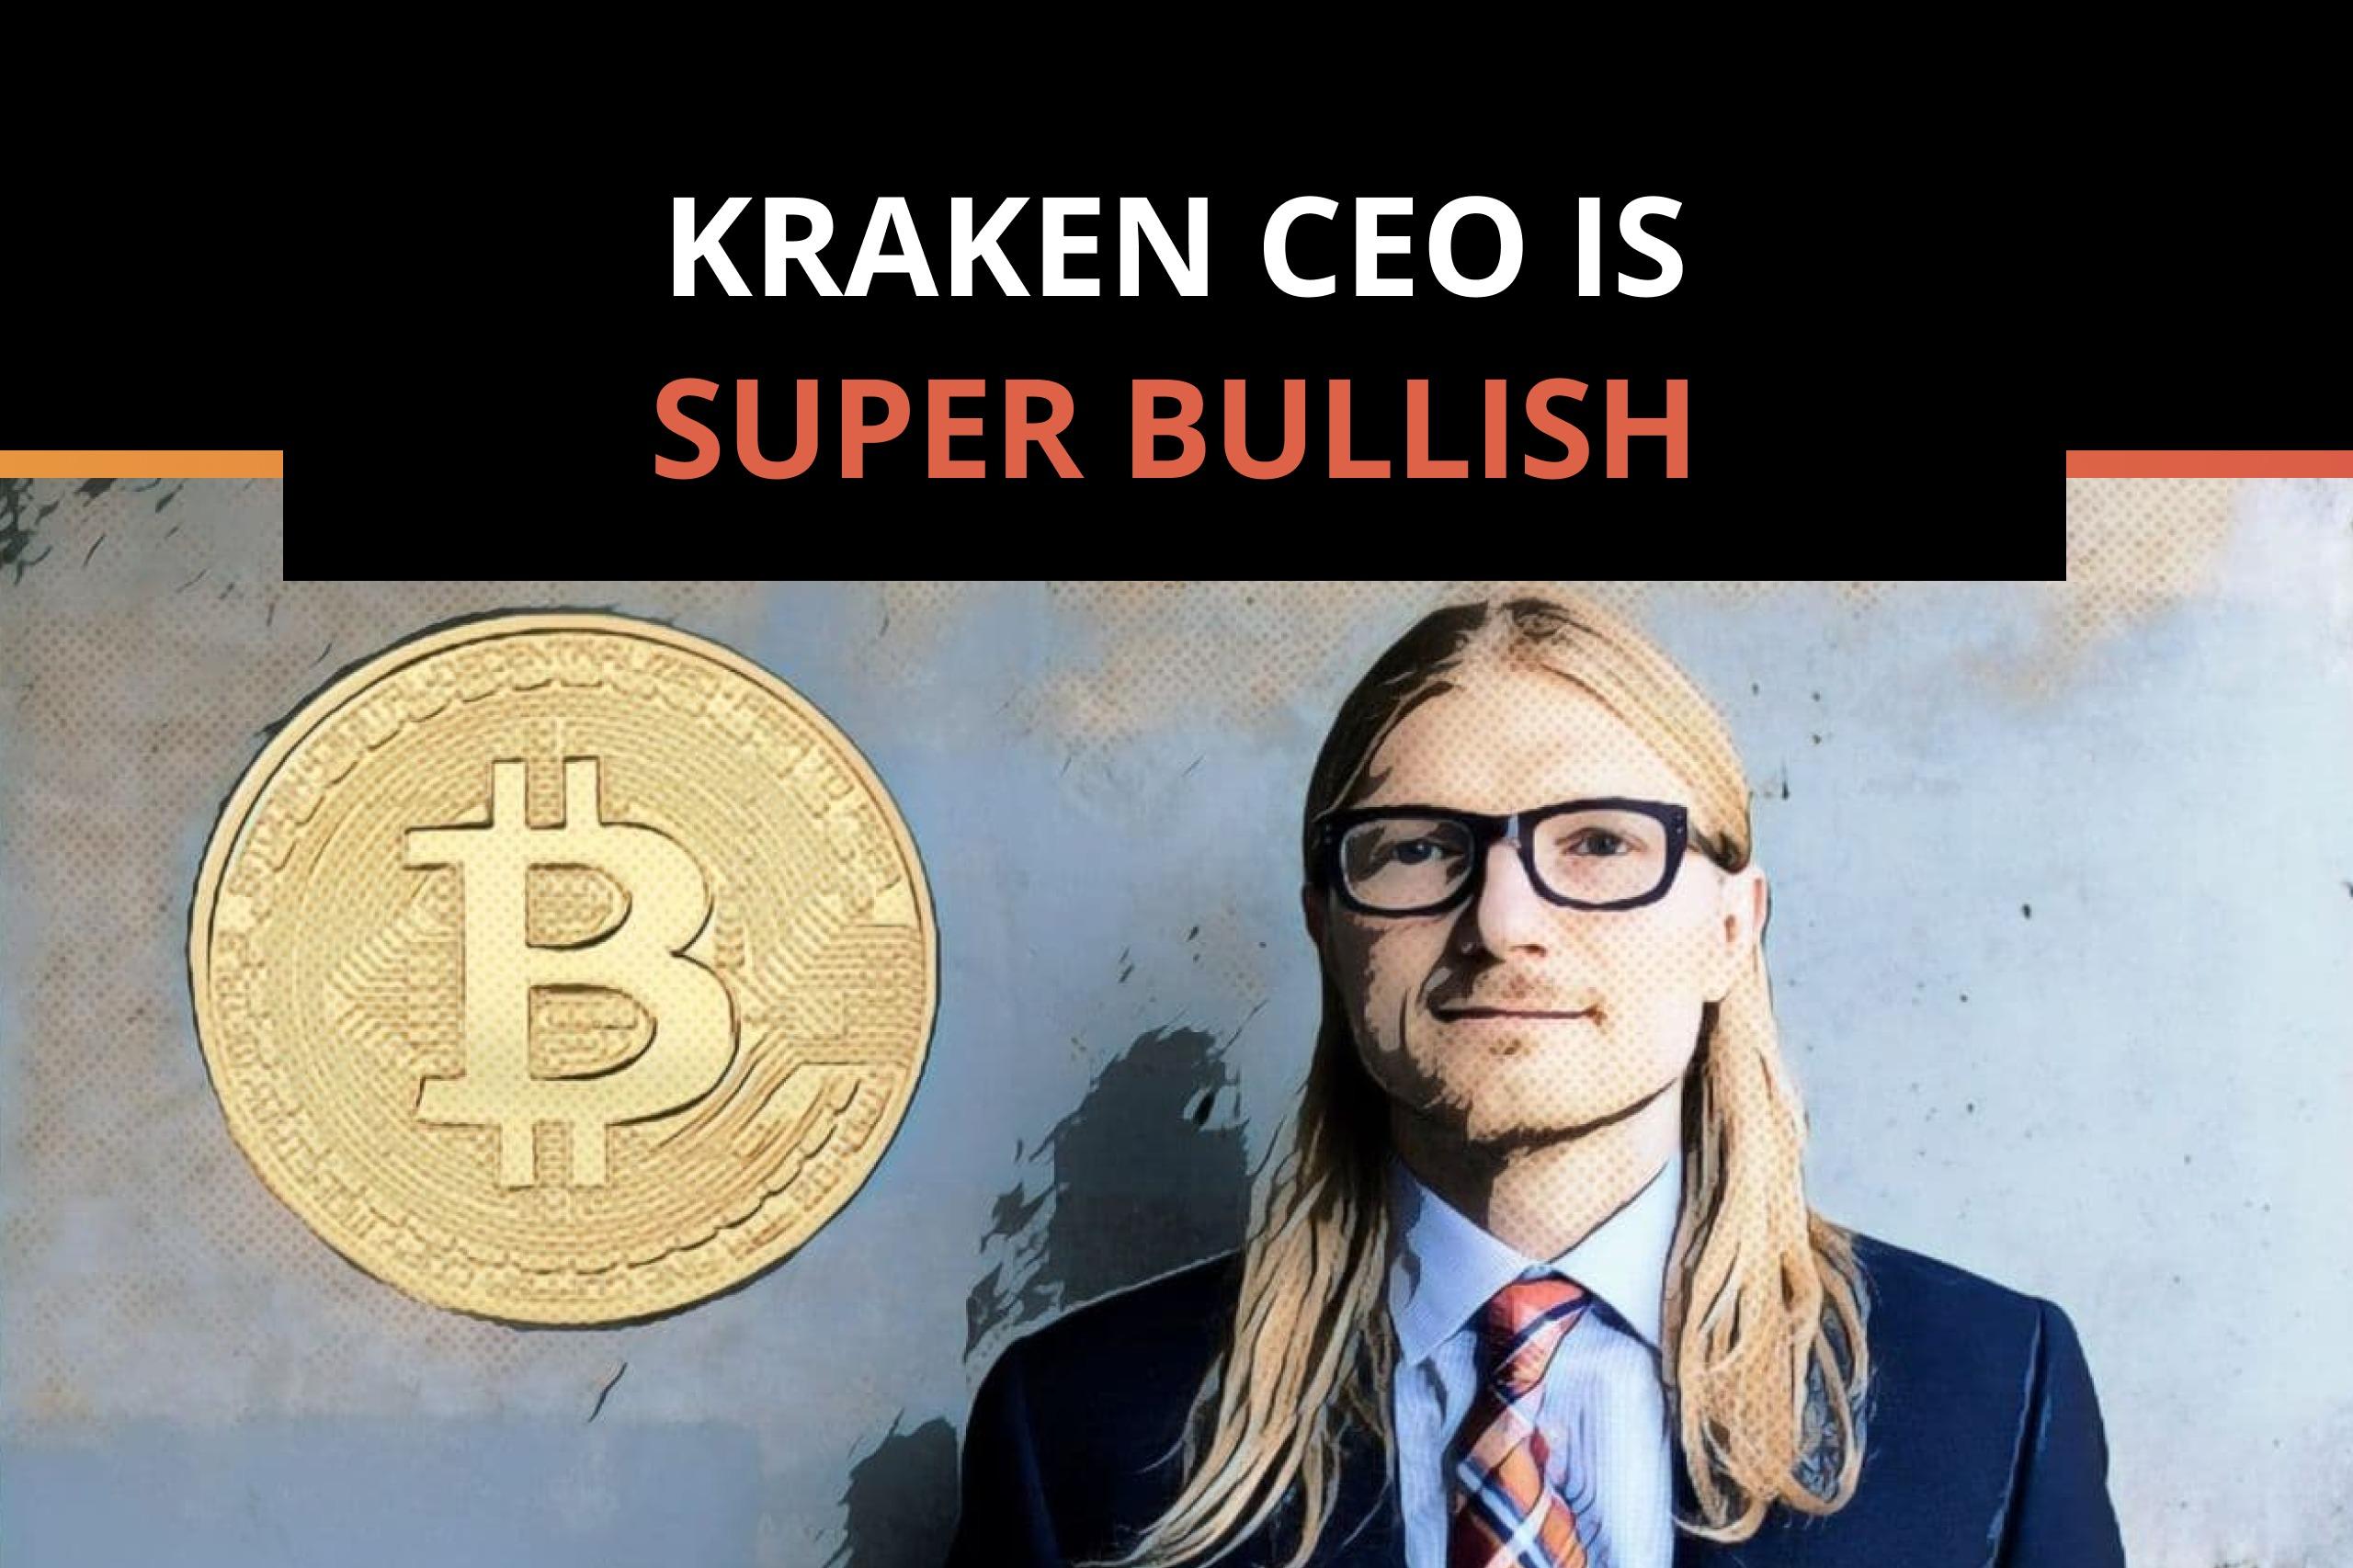 Kraken CEO Predicts Bitcoin Achieves $1 Million